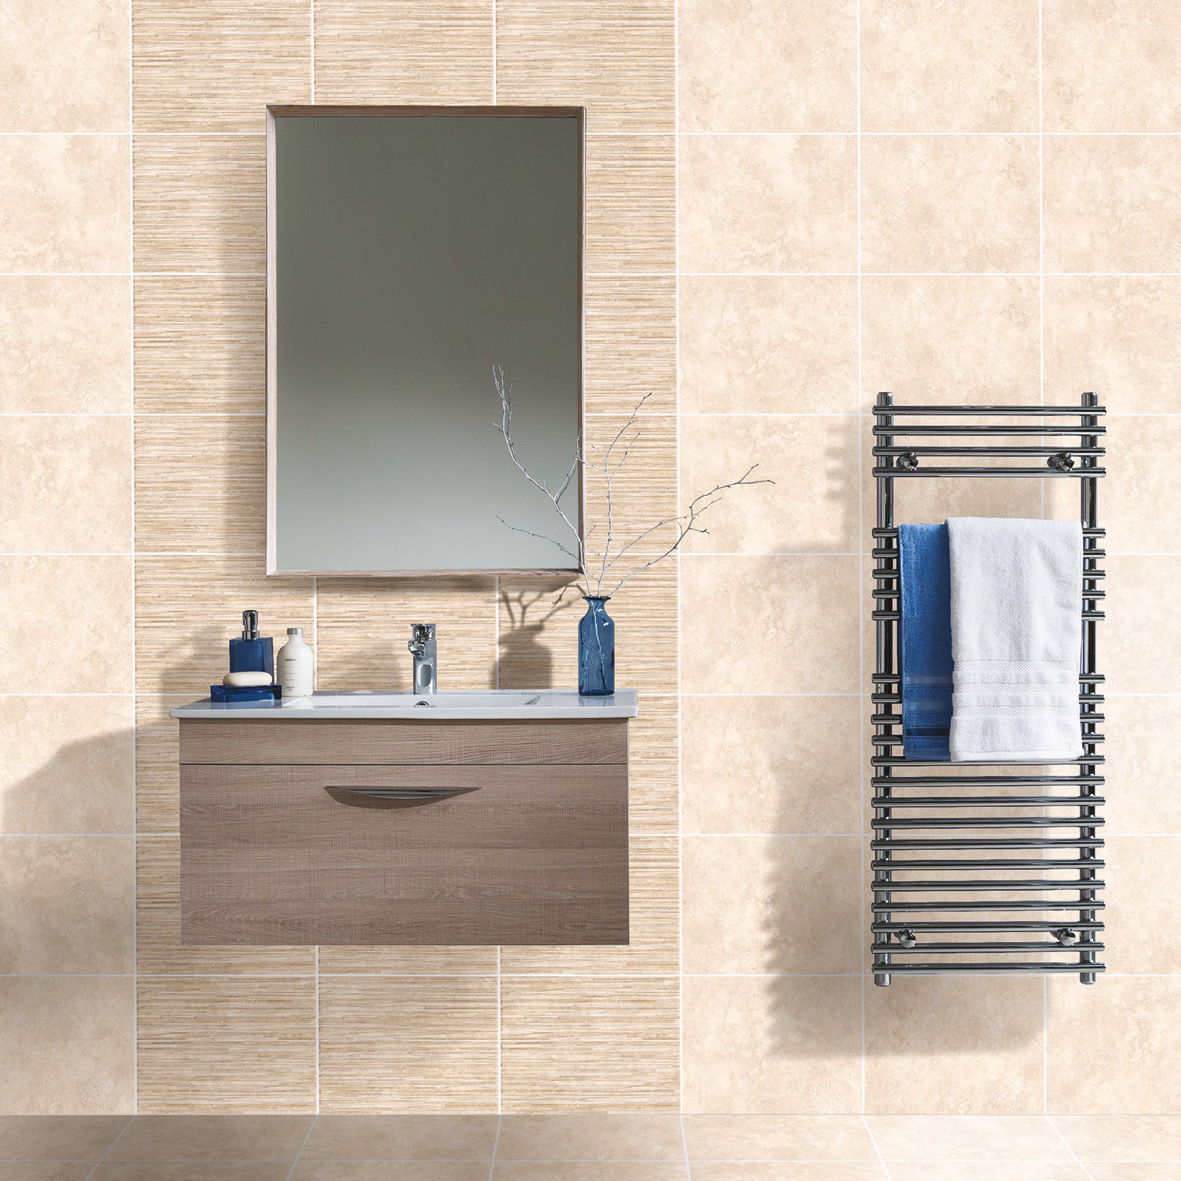 Accona Light Rock Satin Tile 360x275mm - Wall Tiles - CTD Tiles